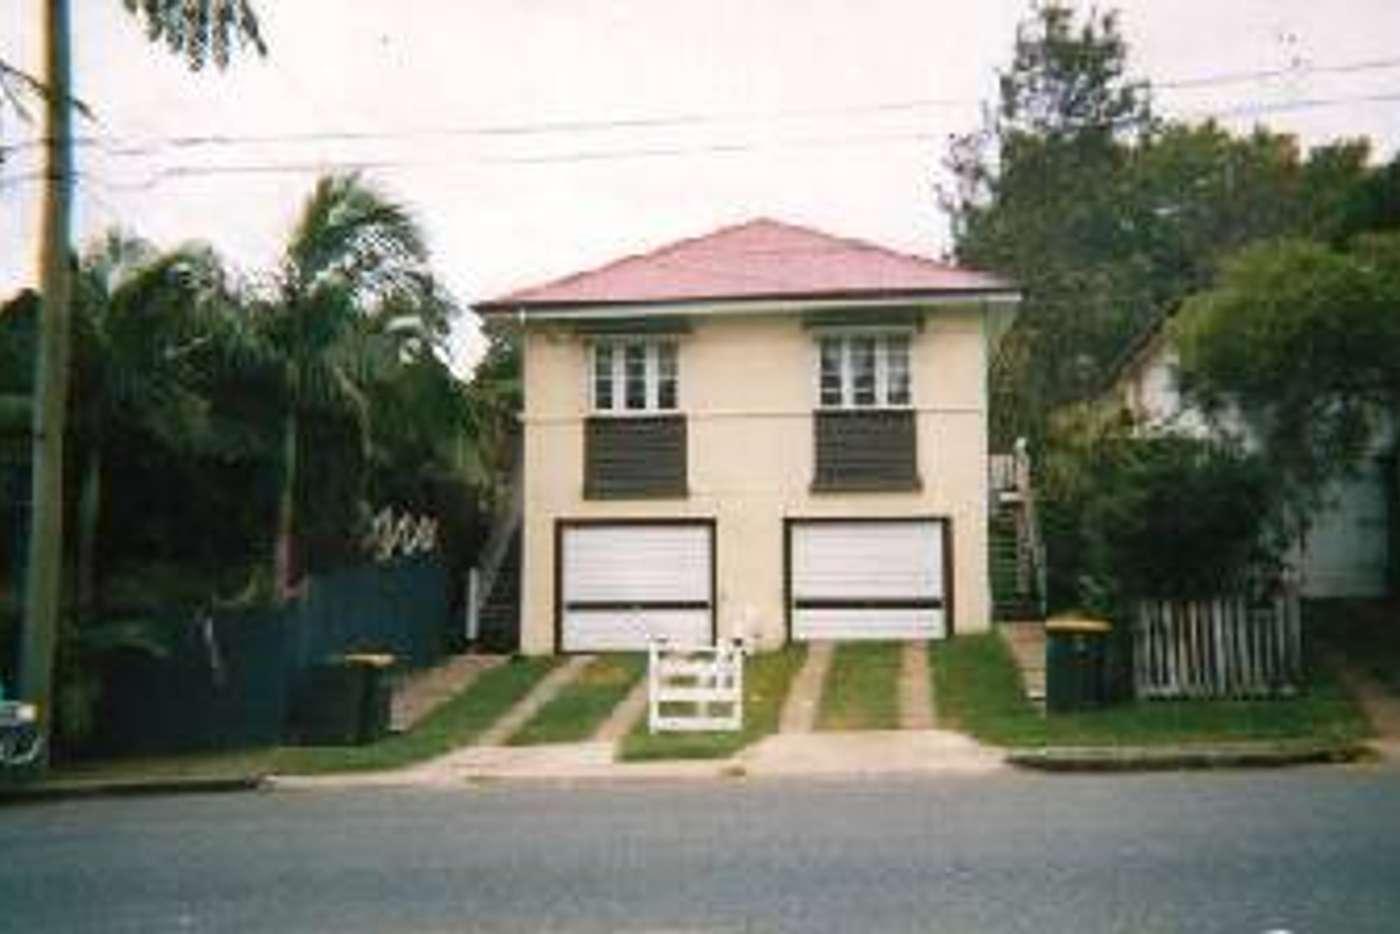 Main view of Homely apartment listing, 91A Haig Road, Auchenflower QLD 4066